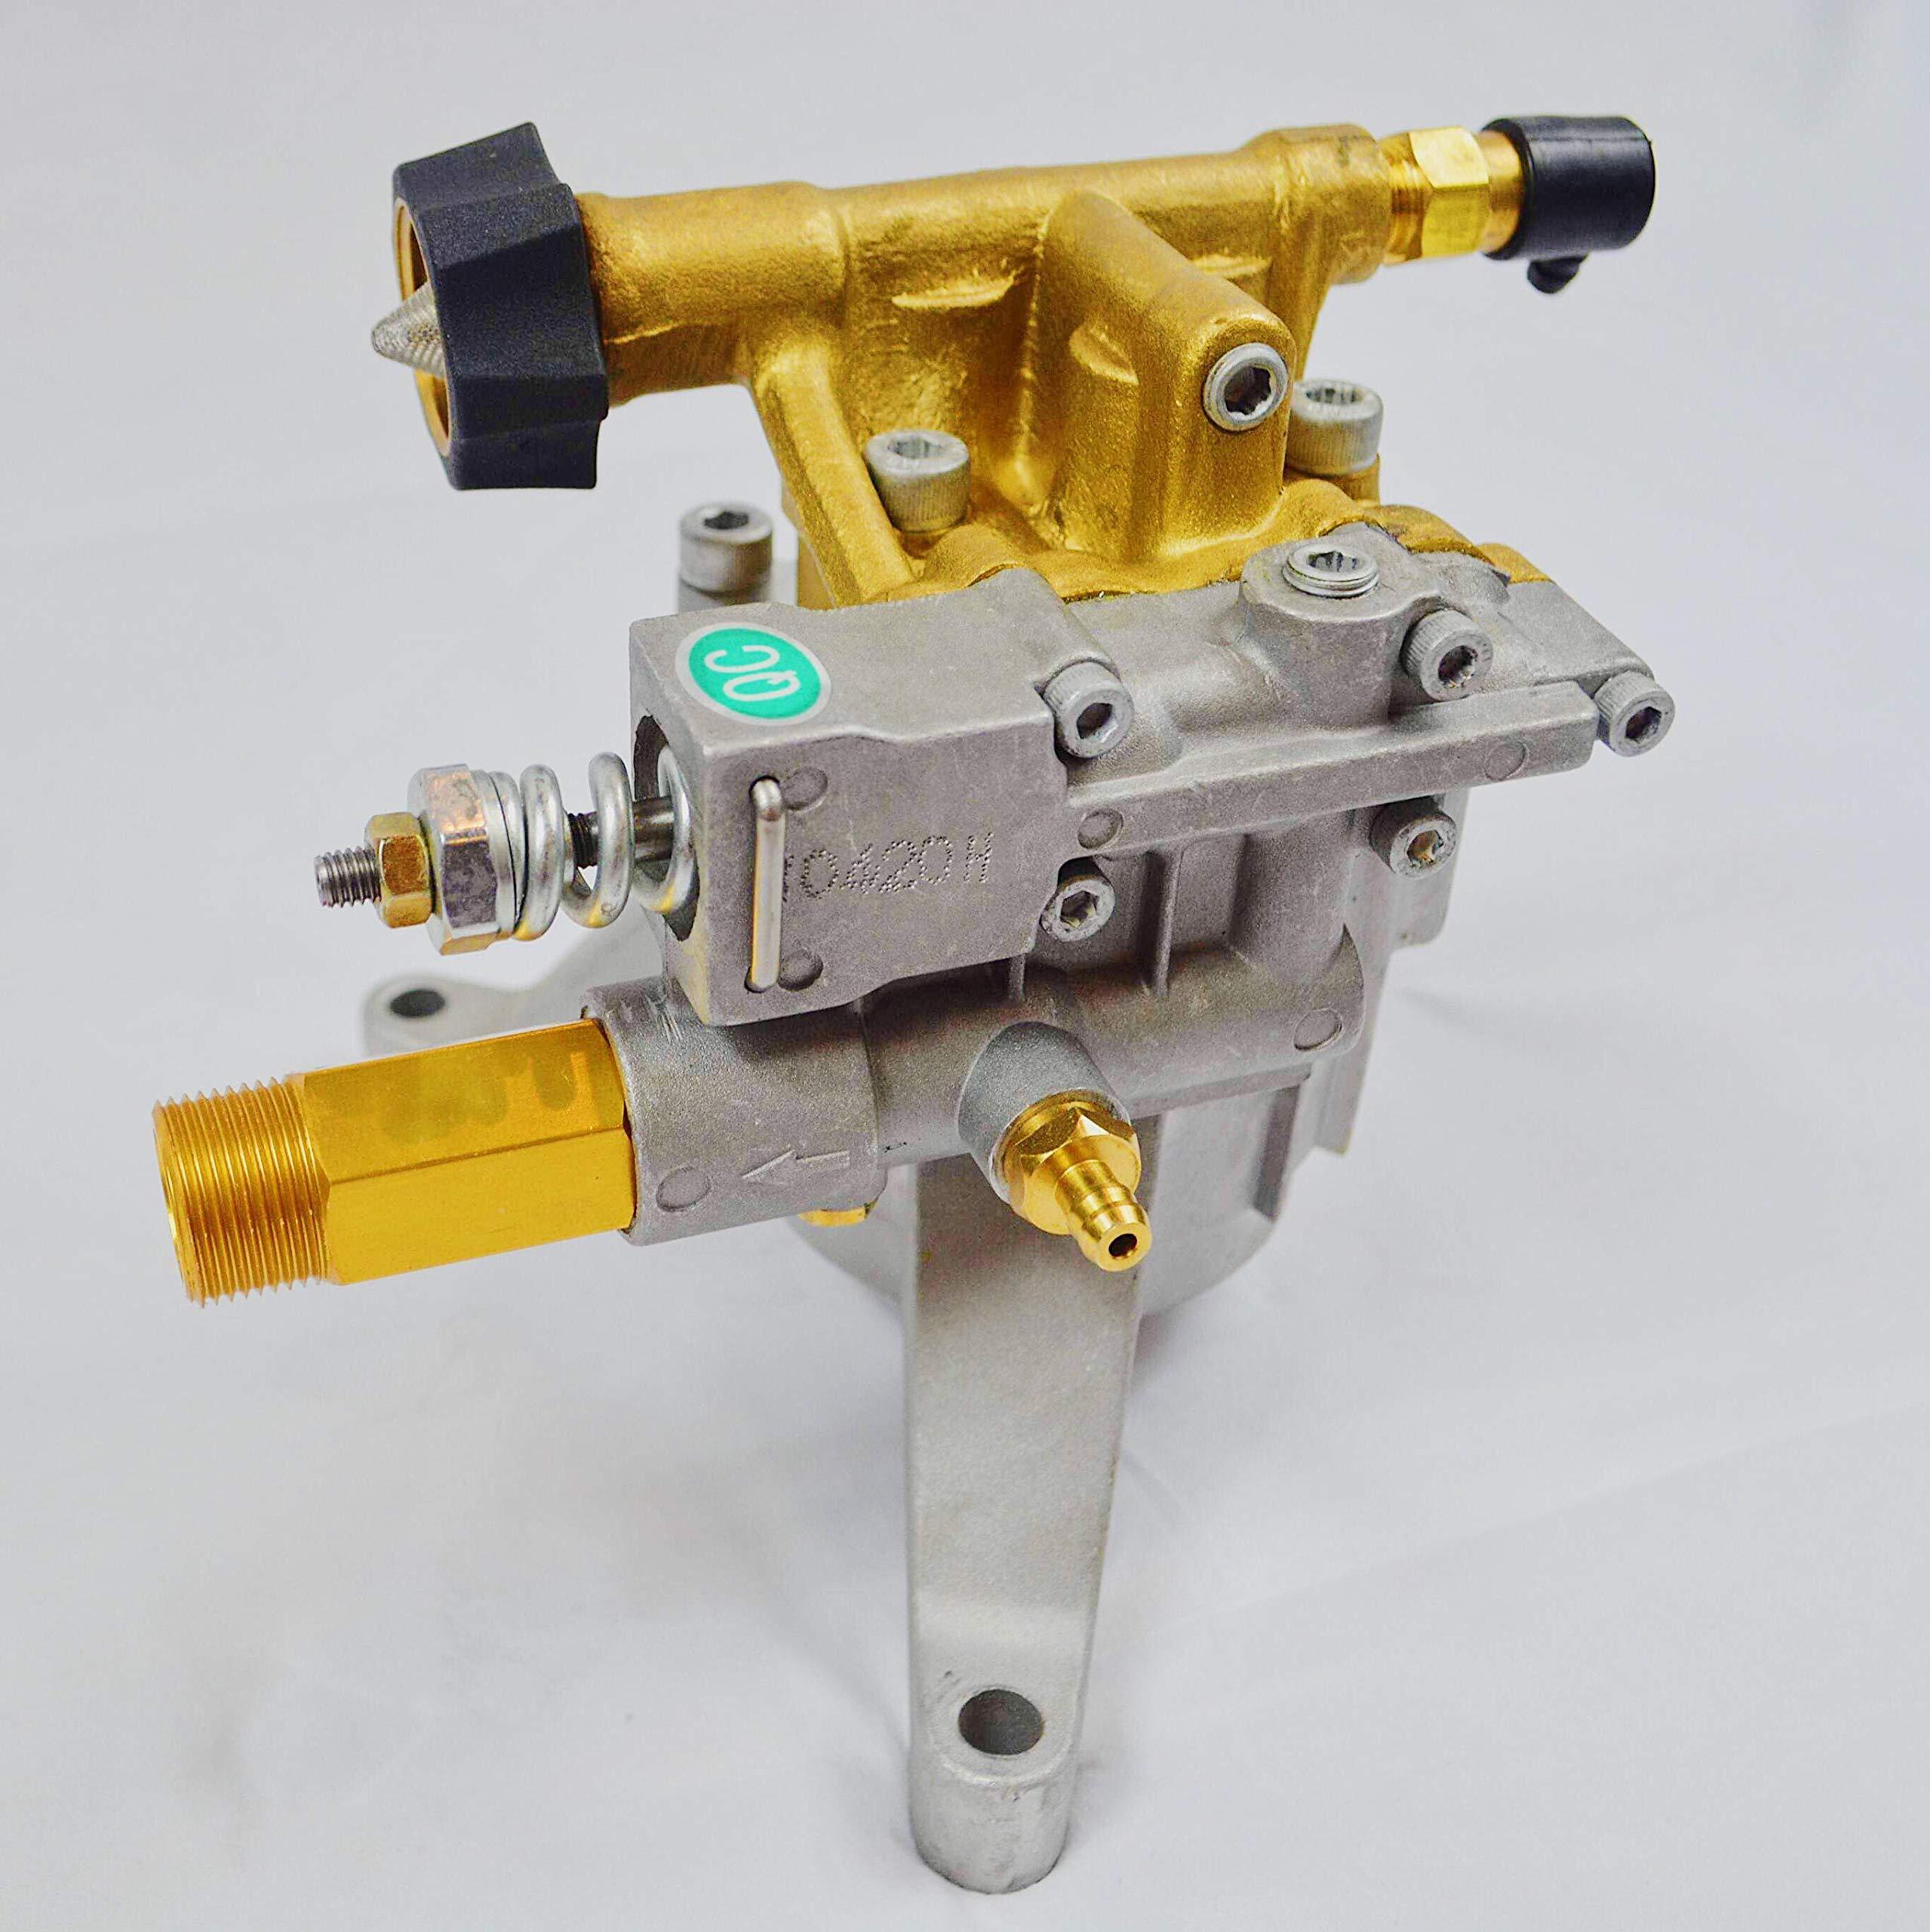 PEGGAS New - Premium - Cold Water - Gasoline - Pressure Washer - Power Washer - Replacement - Axial Vertical Pump 7/8'' Shaft - 3000-3200 PSI 2.5 GPM Brass Head - Simpson - Briggs & Stratton - Ryobi